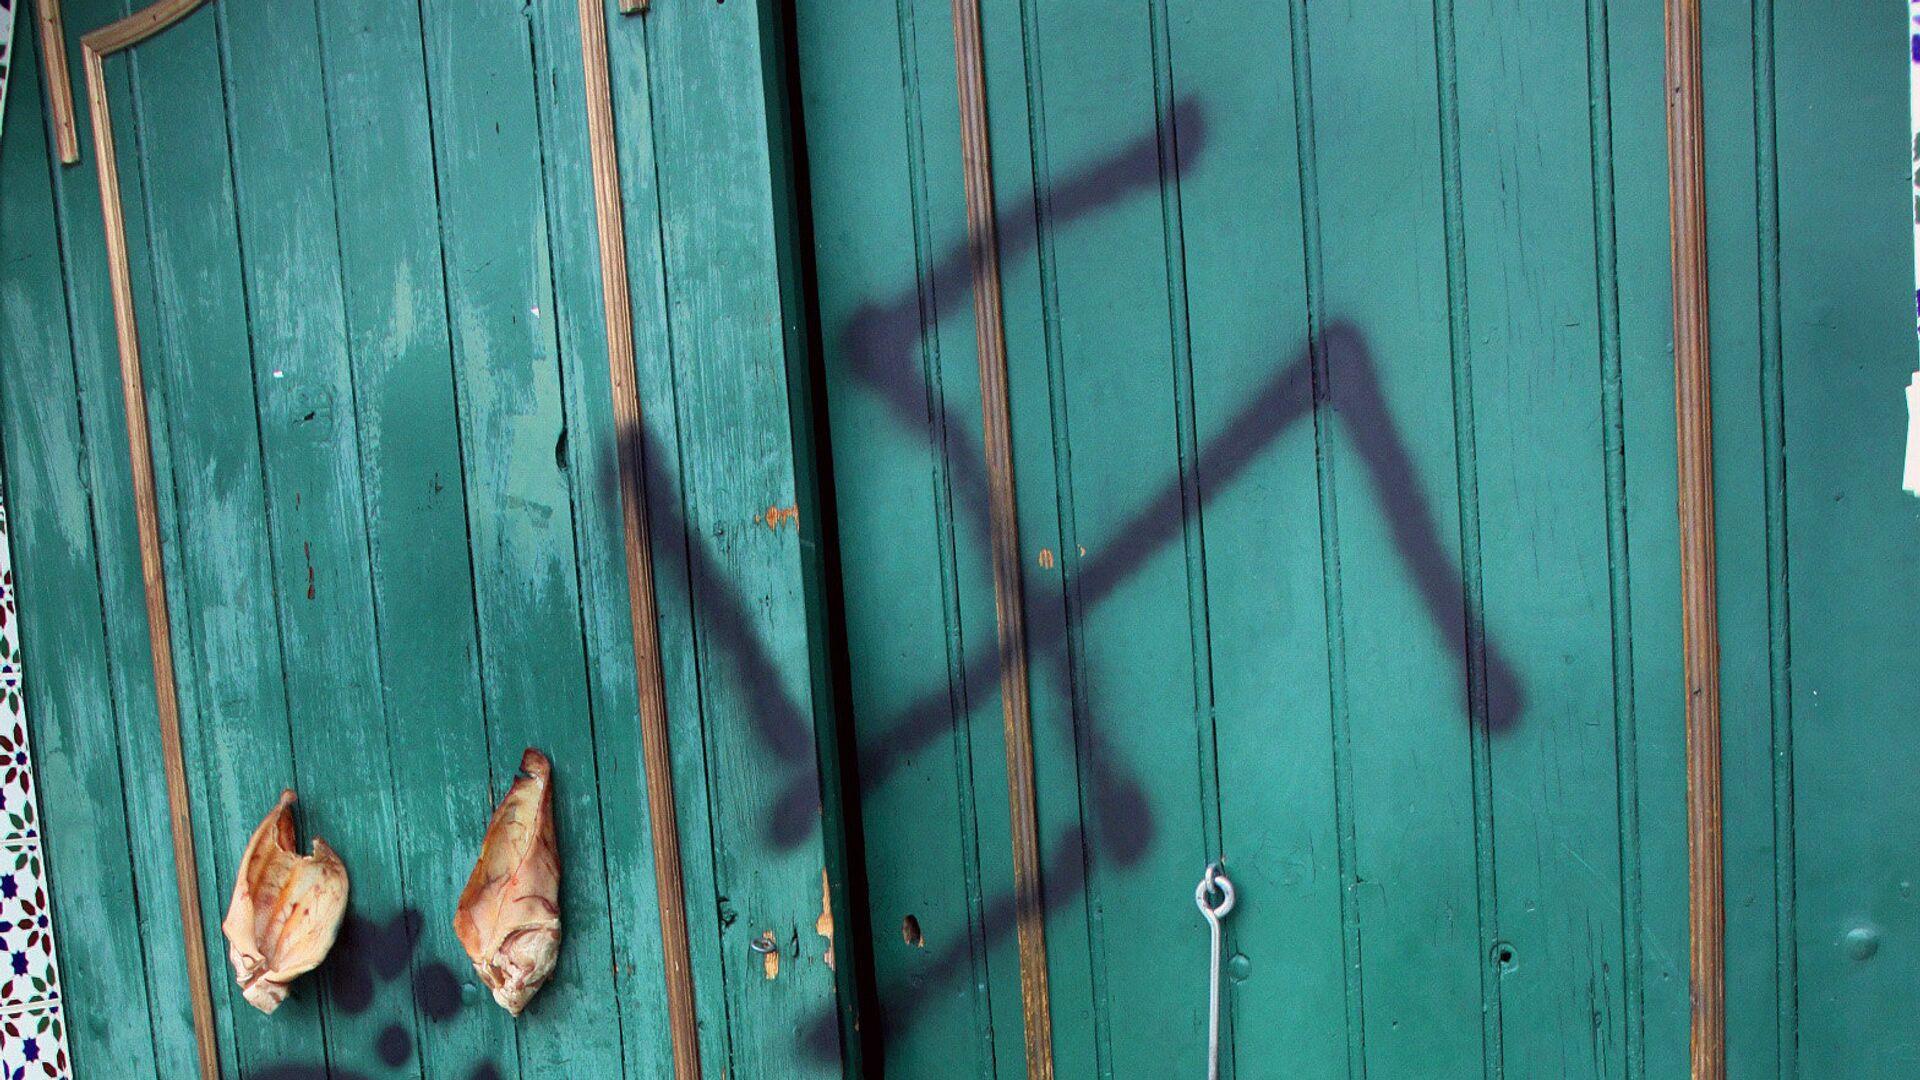 Xenophobic neo-nazi propos were spray-painted on the wall - Sputnik Mundo, 1920, 04.03.2021